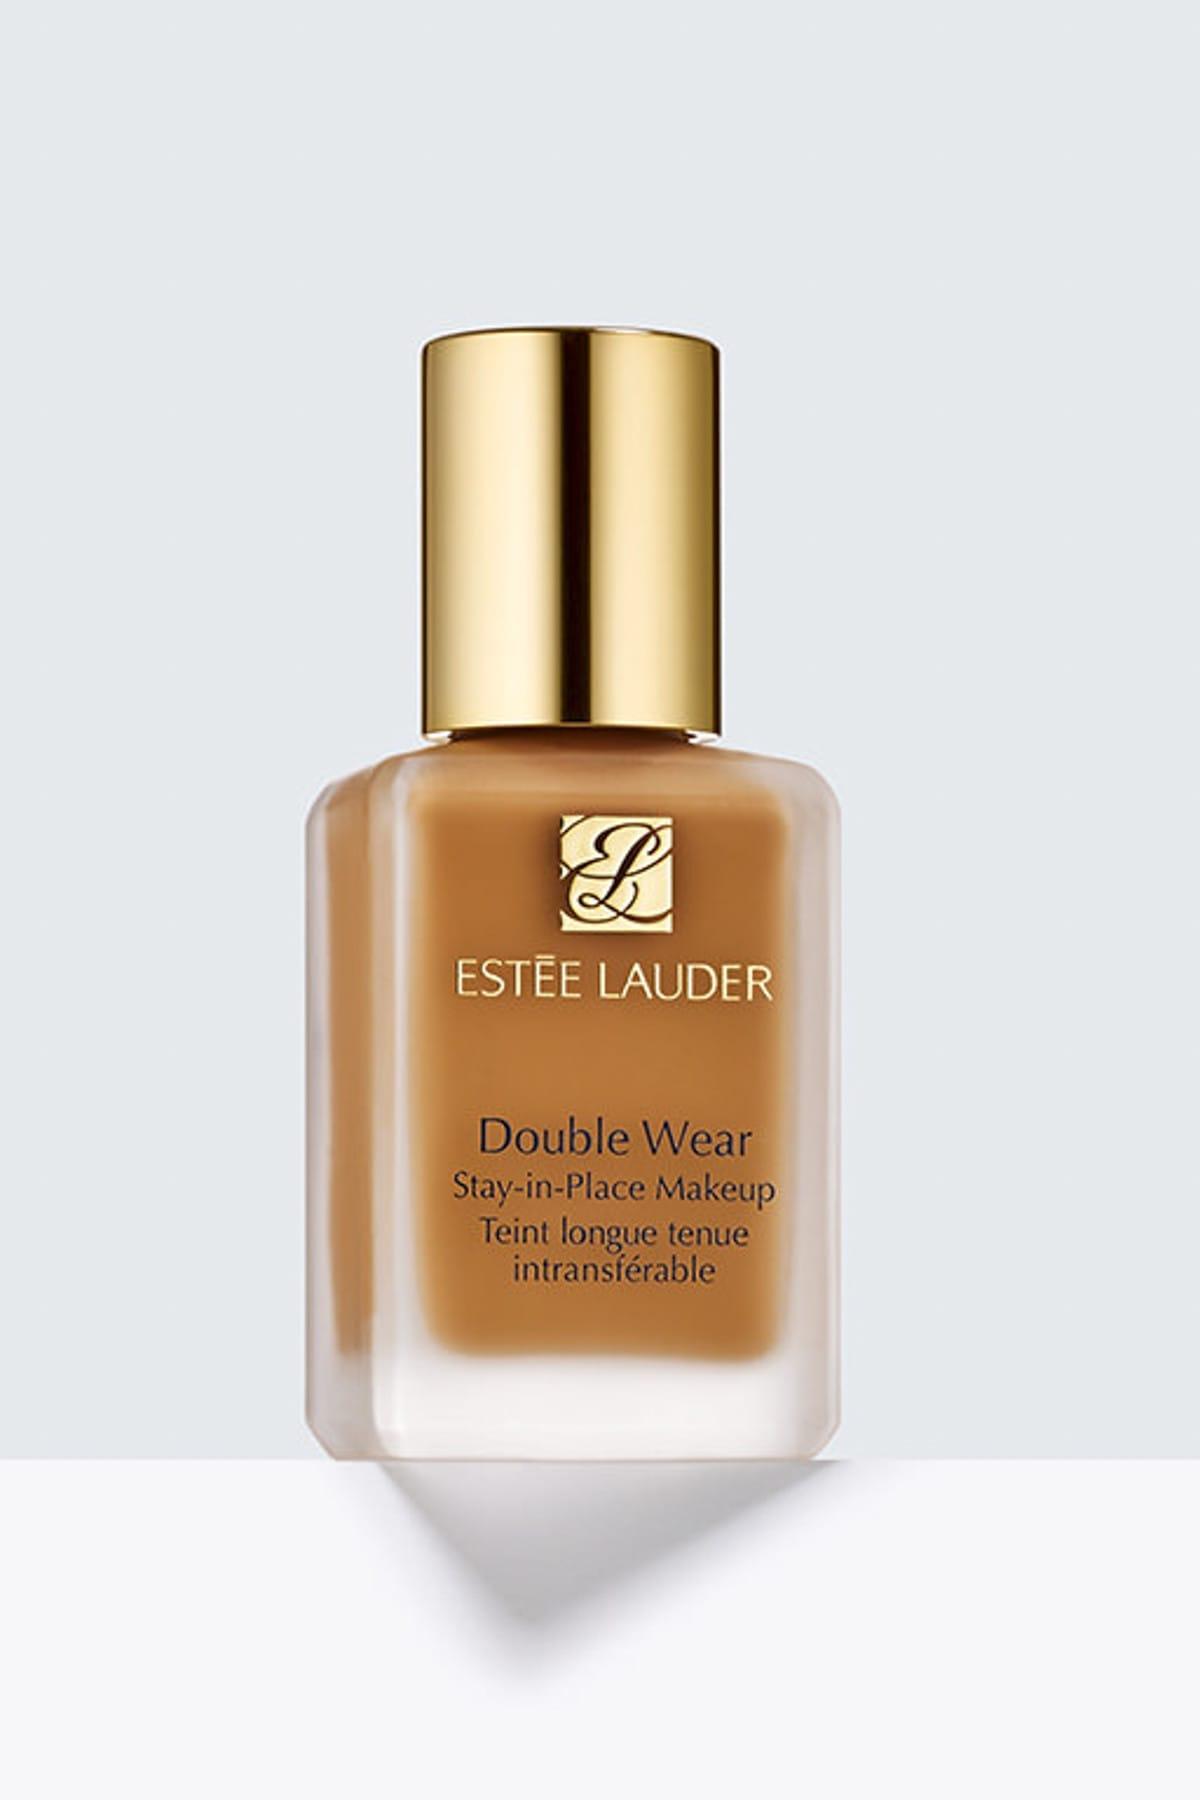 Estee Lauder Fondöten - Double Wear Foundation S.I.P Spf10 5W2 Rich Caramel30 ml 027131836452 1